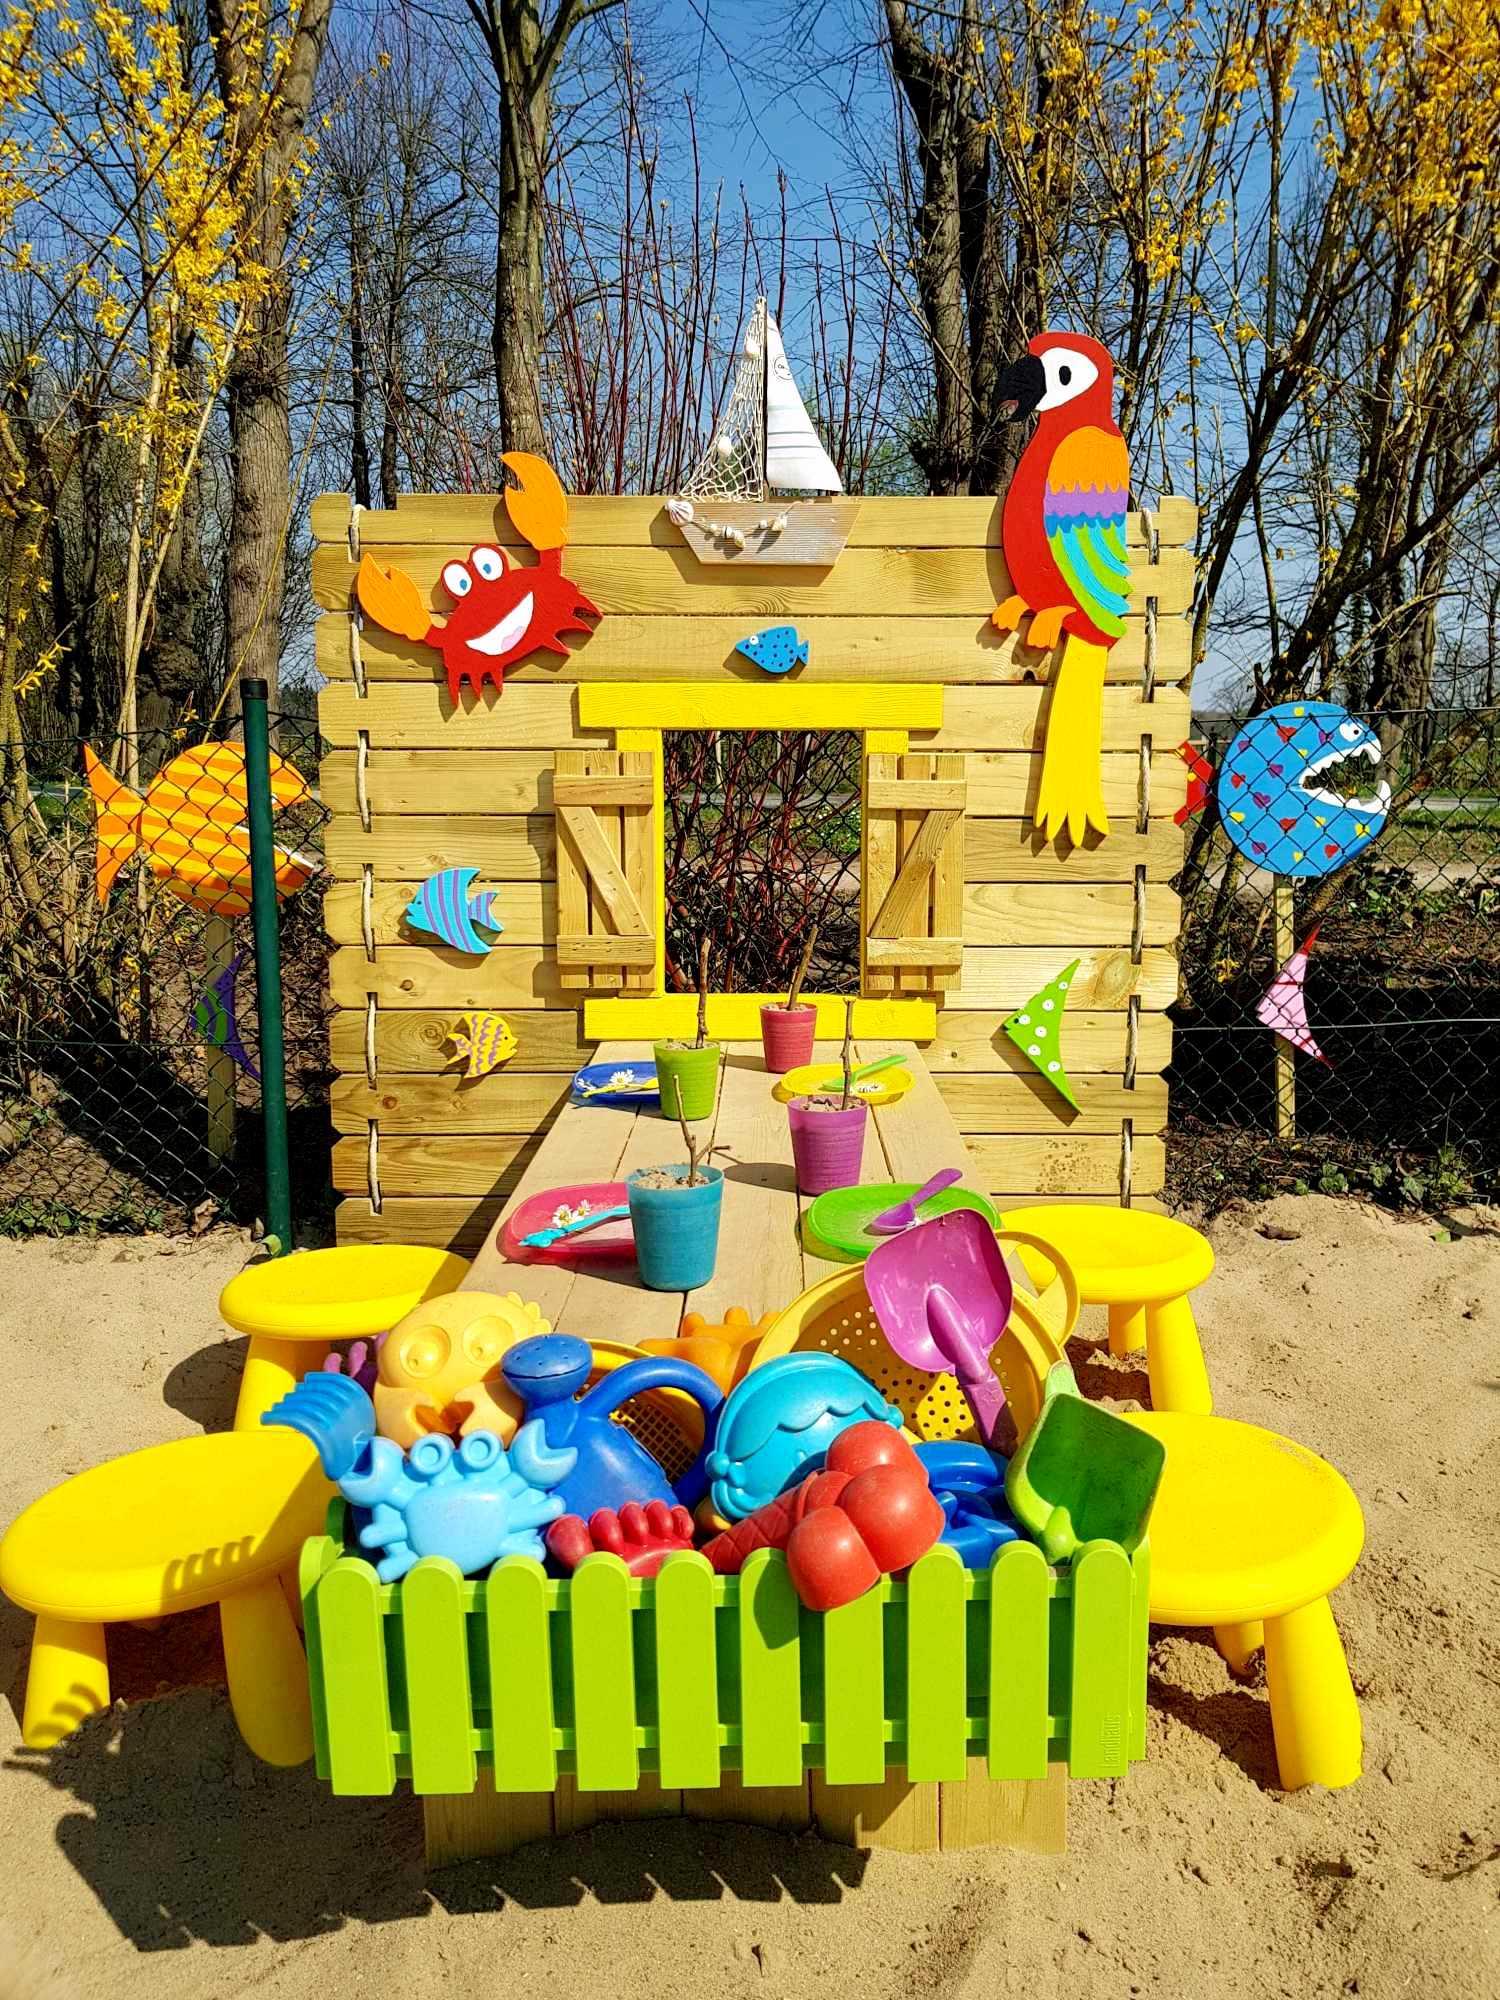 Kita Kid Zone Kinderbetreuung Garten 1 5 - Betreuungspaket